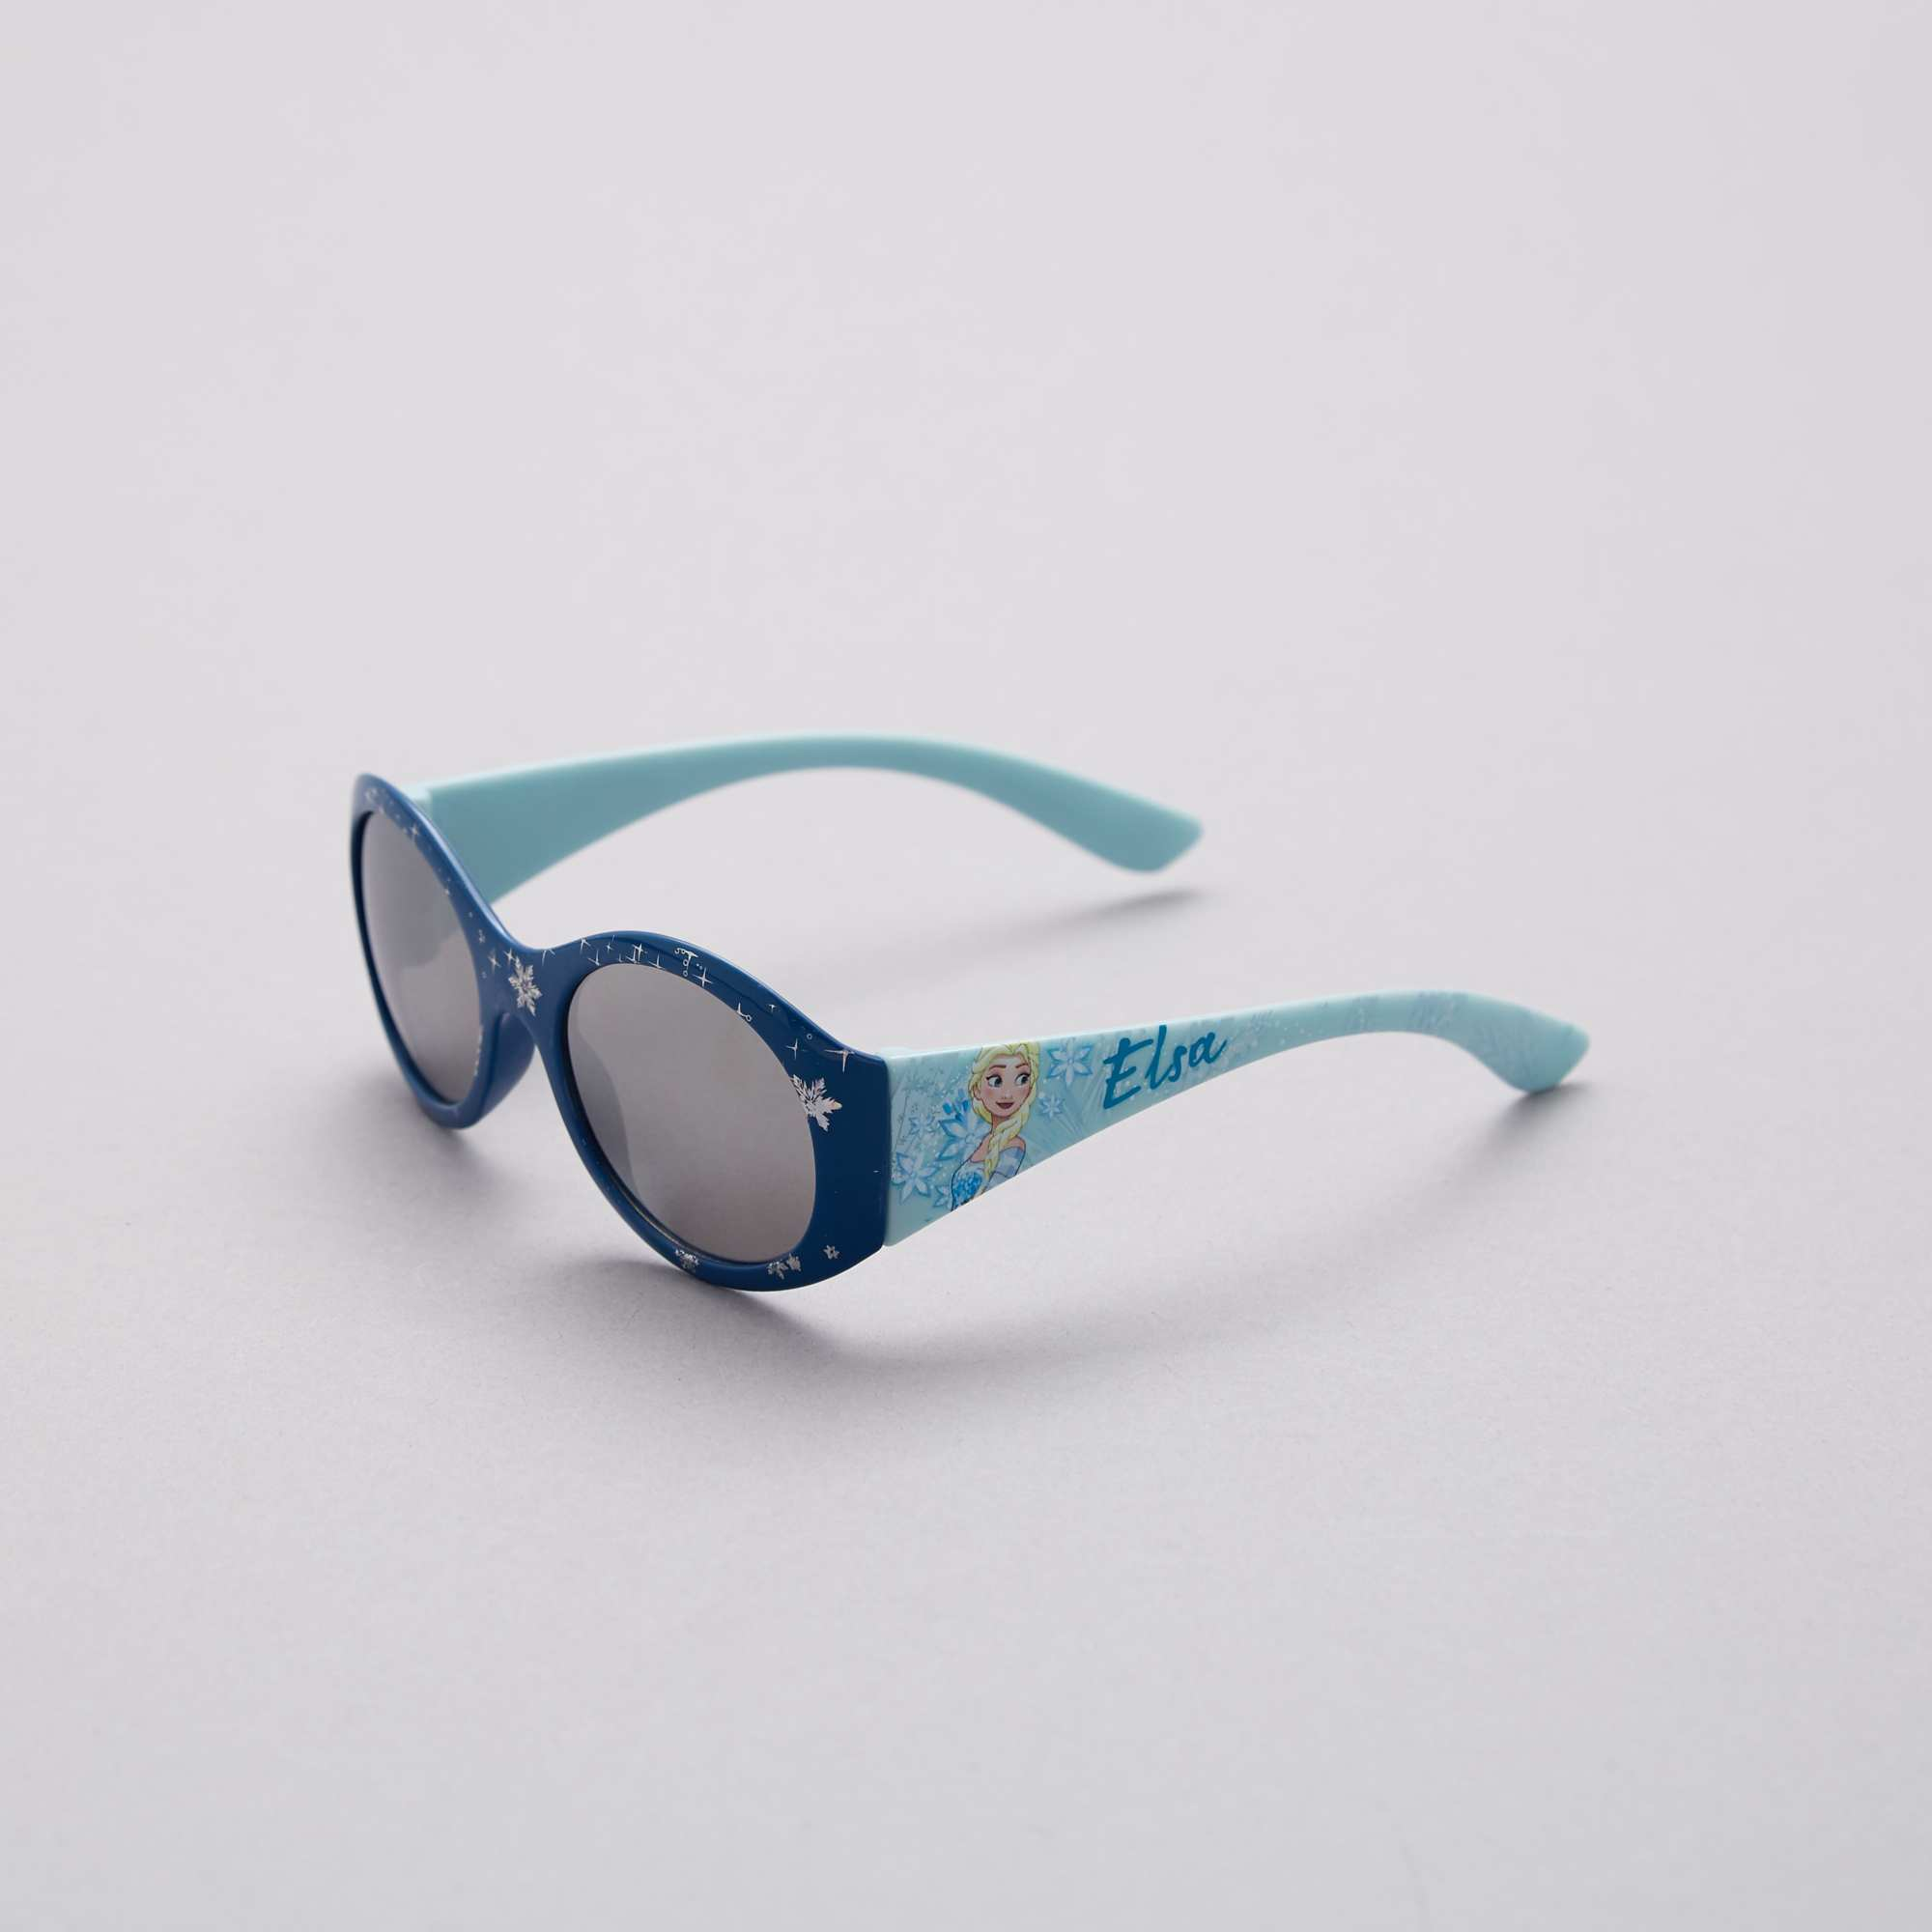 27798e3aa2038 Óculos de sol  Frozen  Azul Menina 3-12 anos. Loading zoom. Clique na  imagem para aumentar. zoom